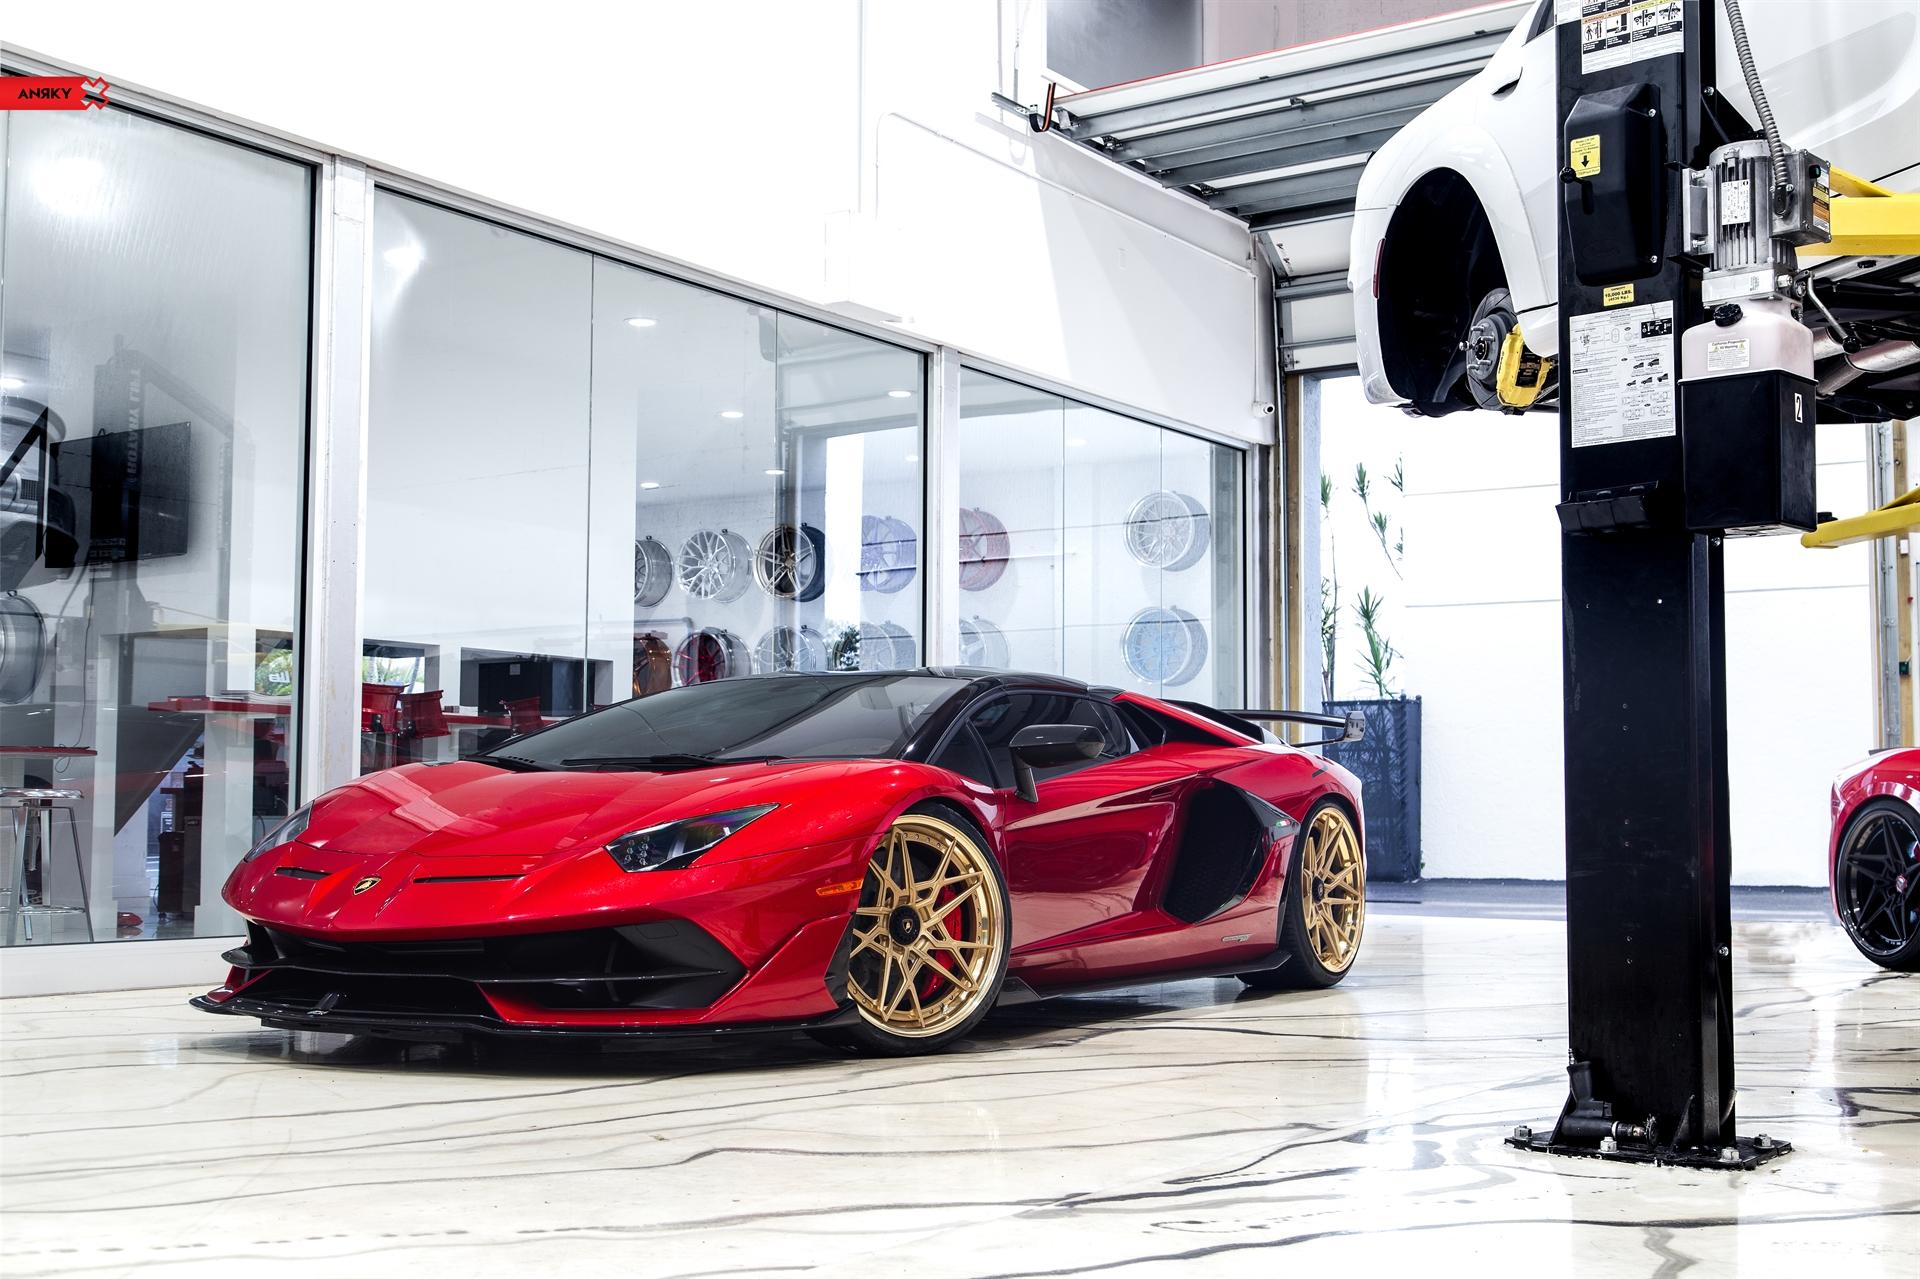 Lamborghini Aventador SVJ – X|Series S1-X2